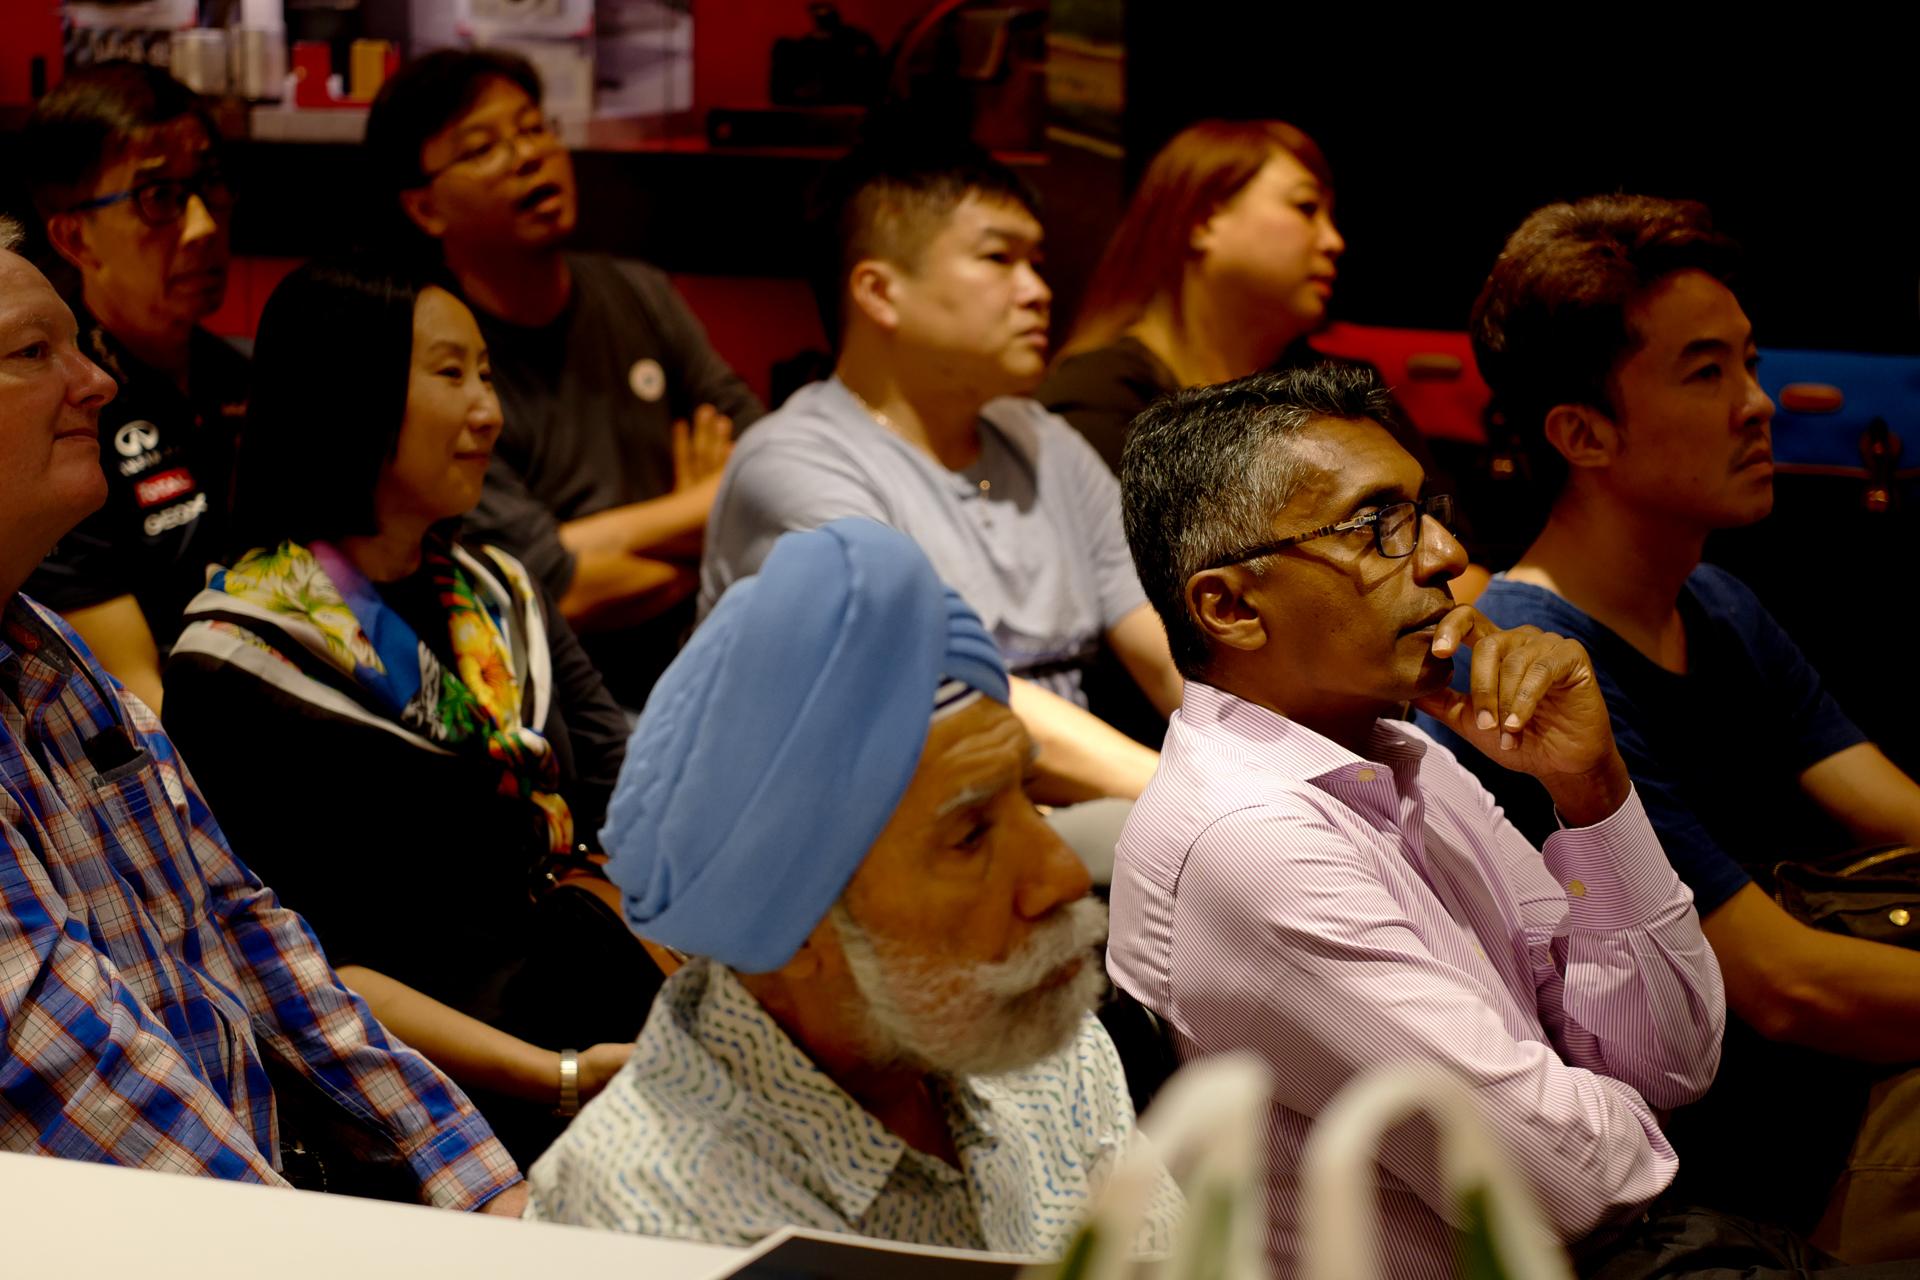 KC_Eng_Singapore_Photographer_L1060898 2.jpg